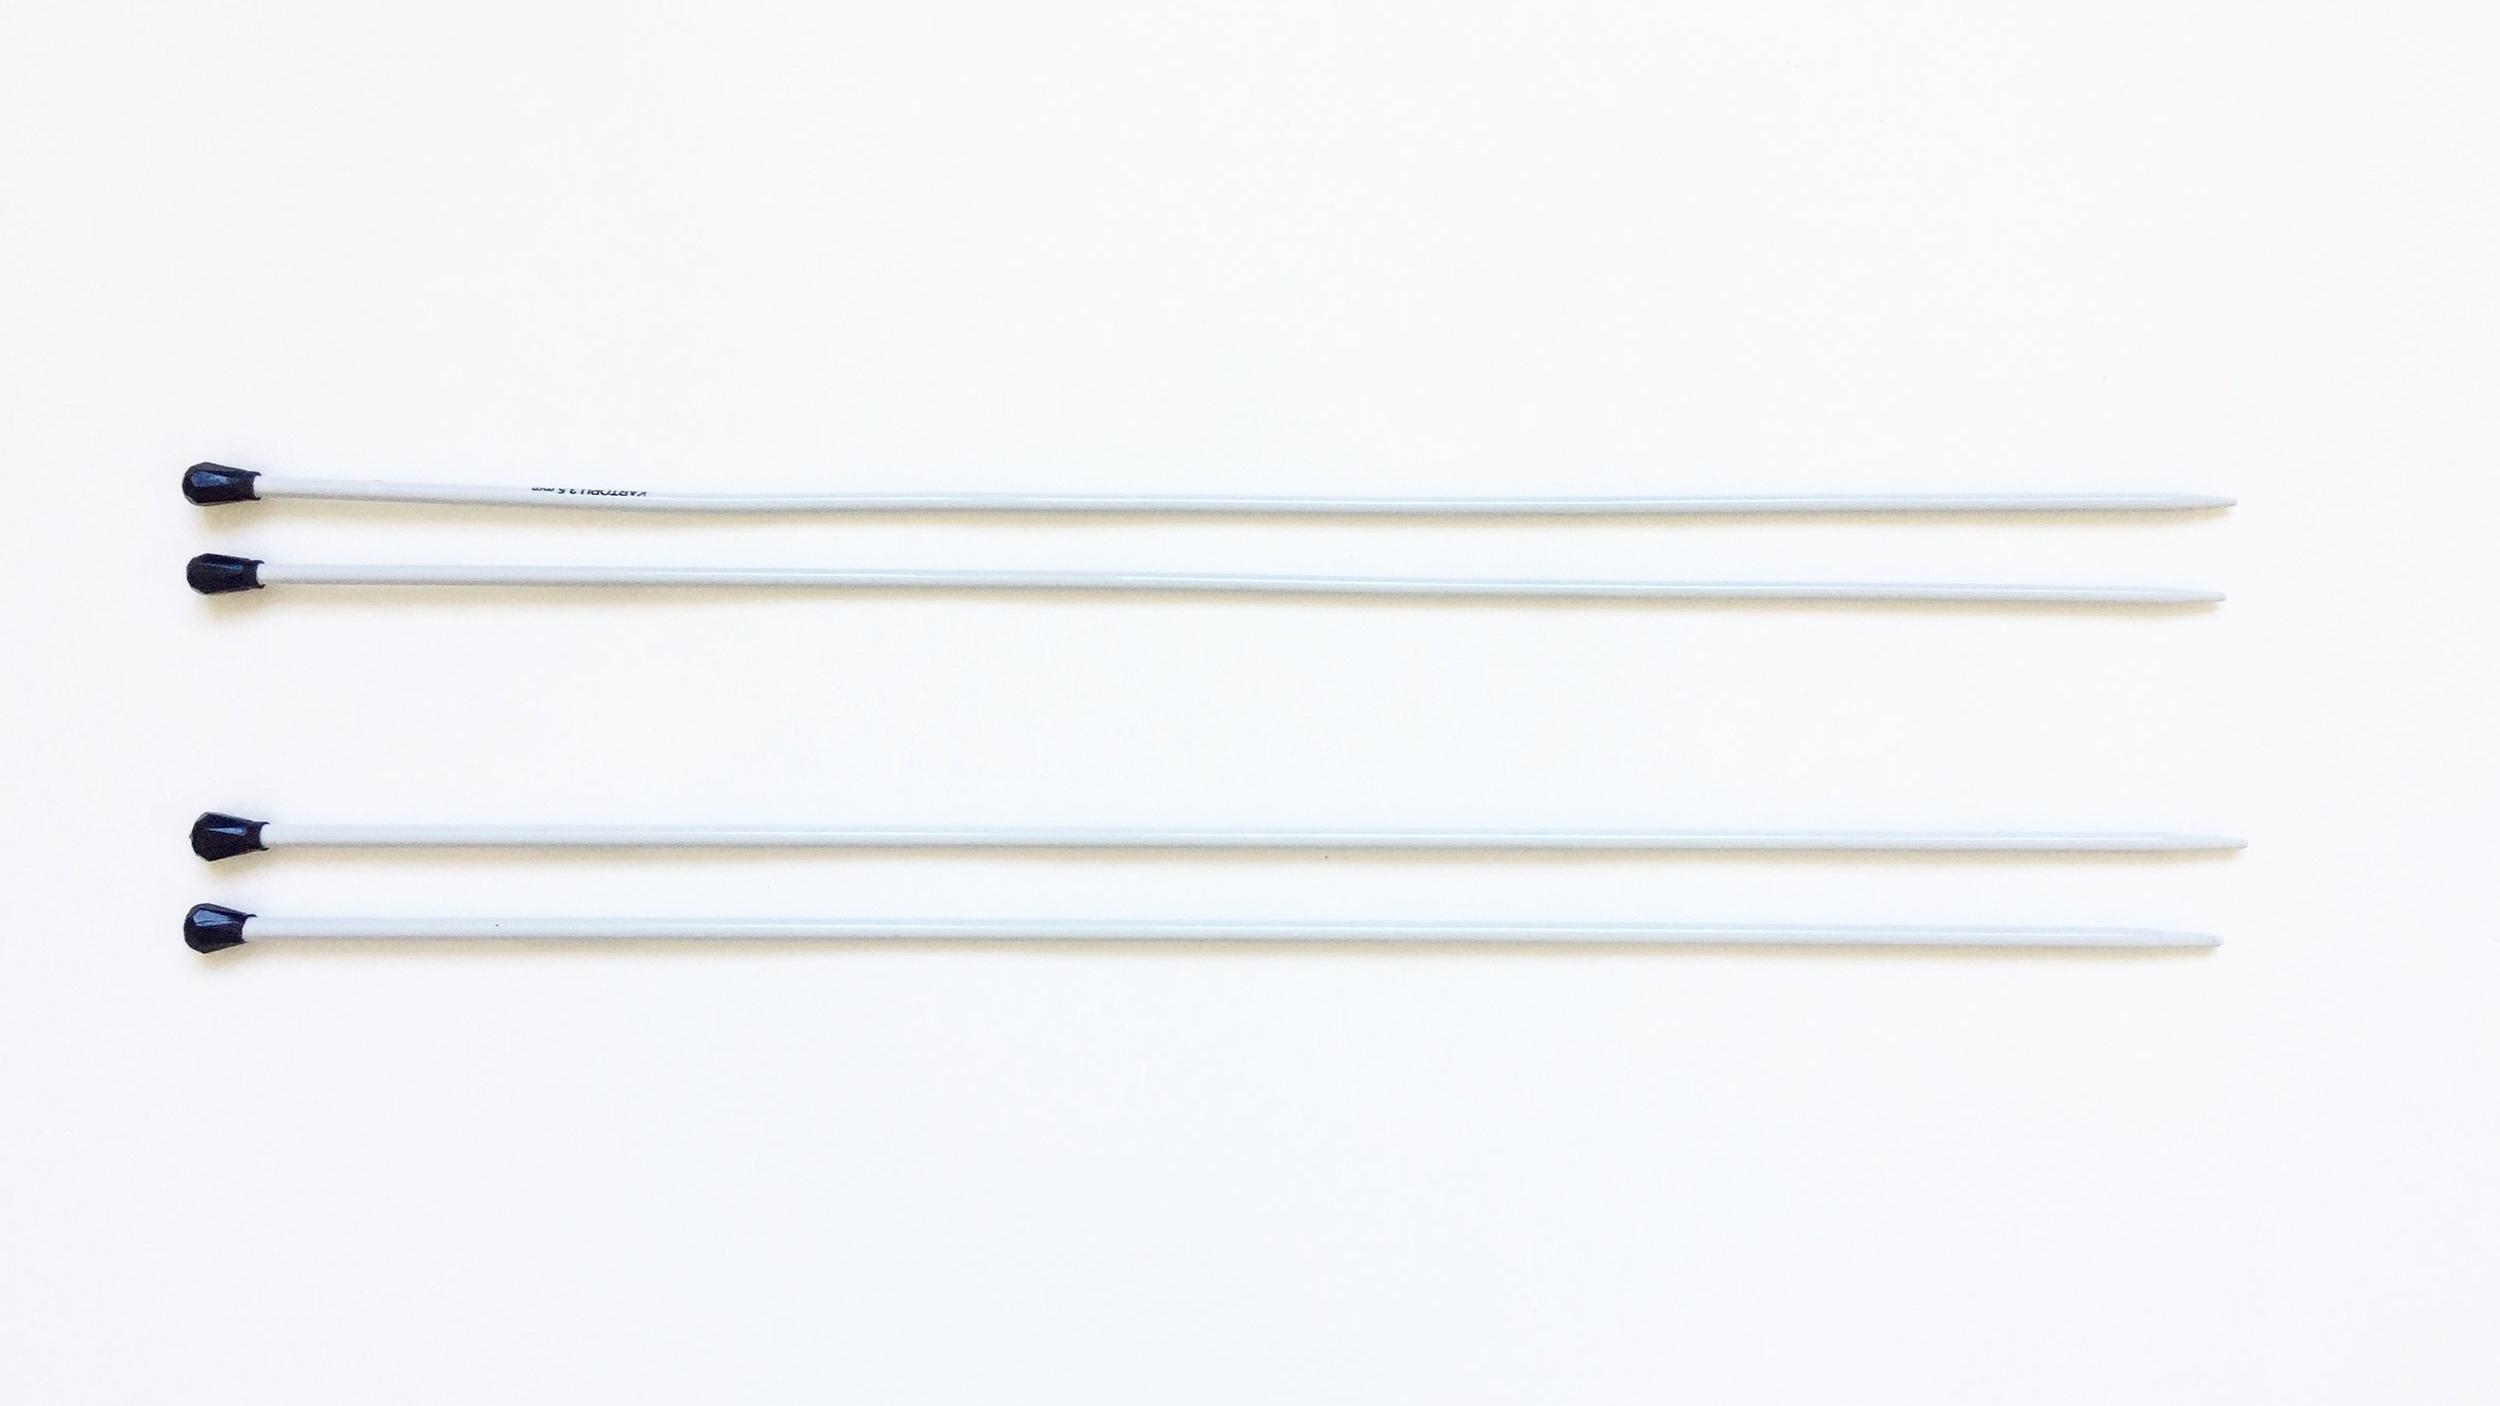 Kartopu knitting needles review